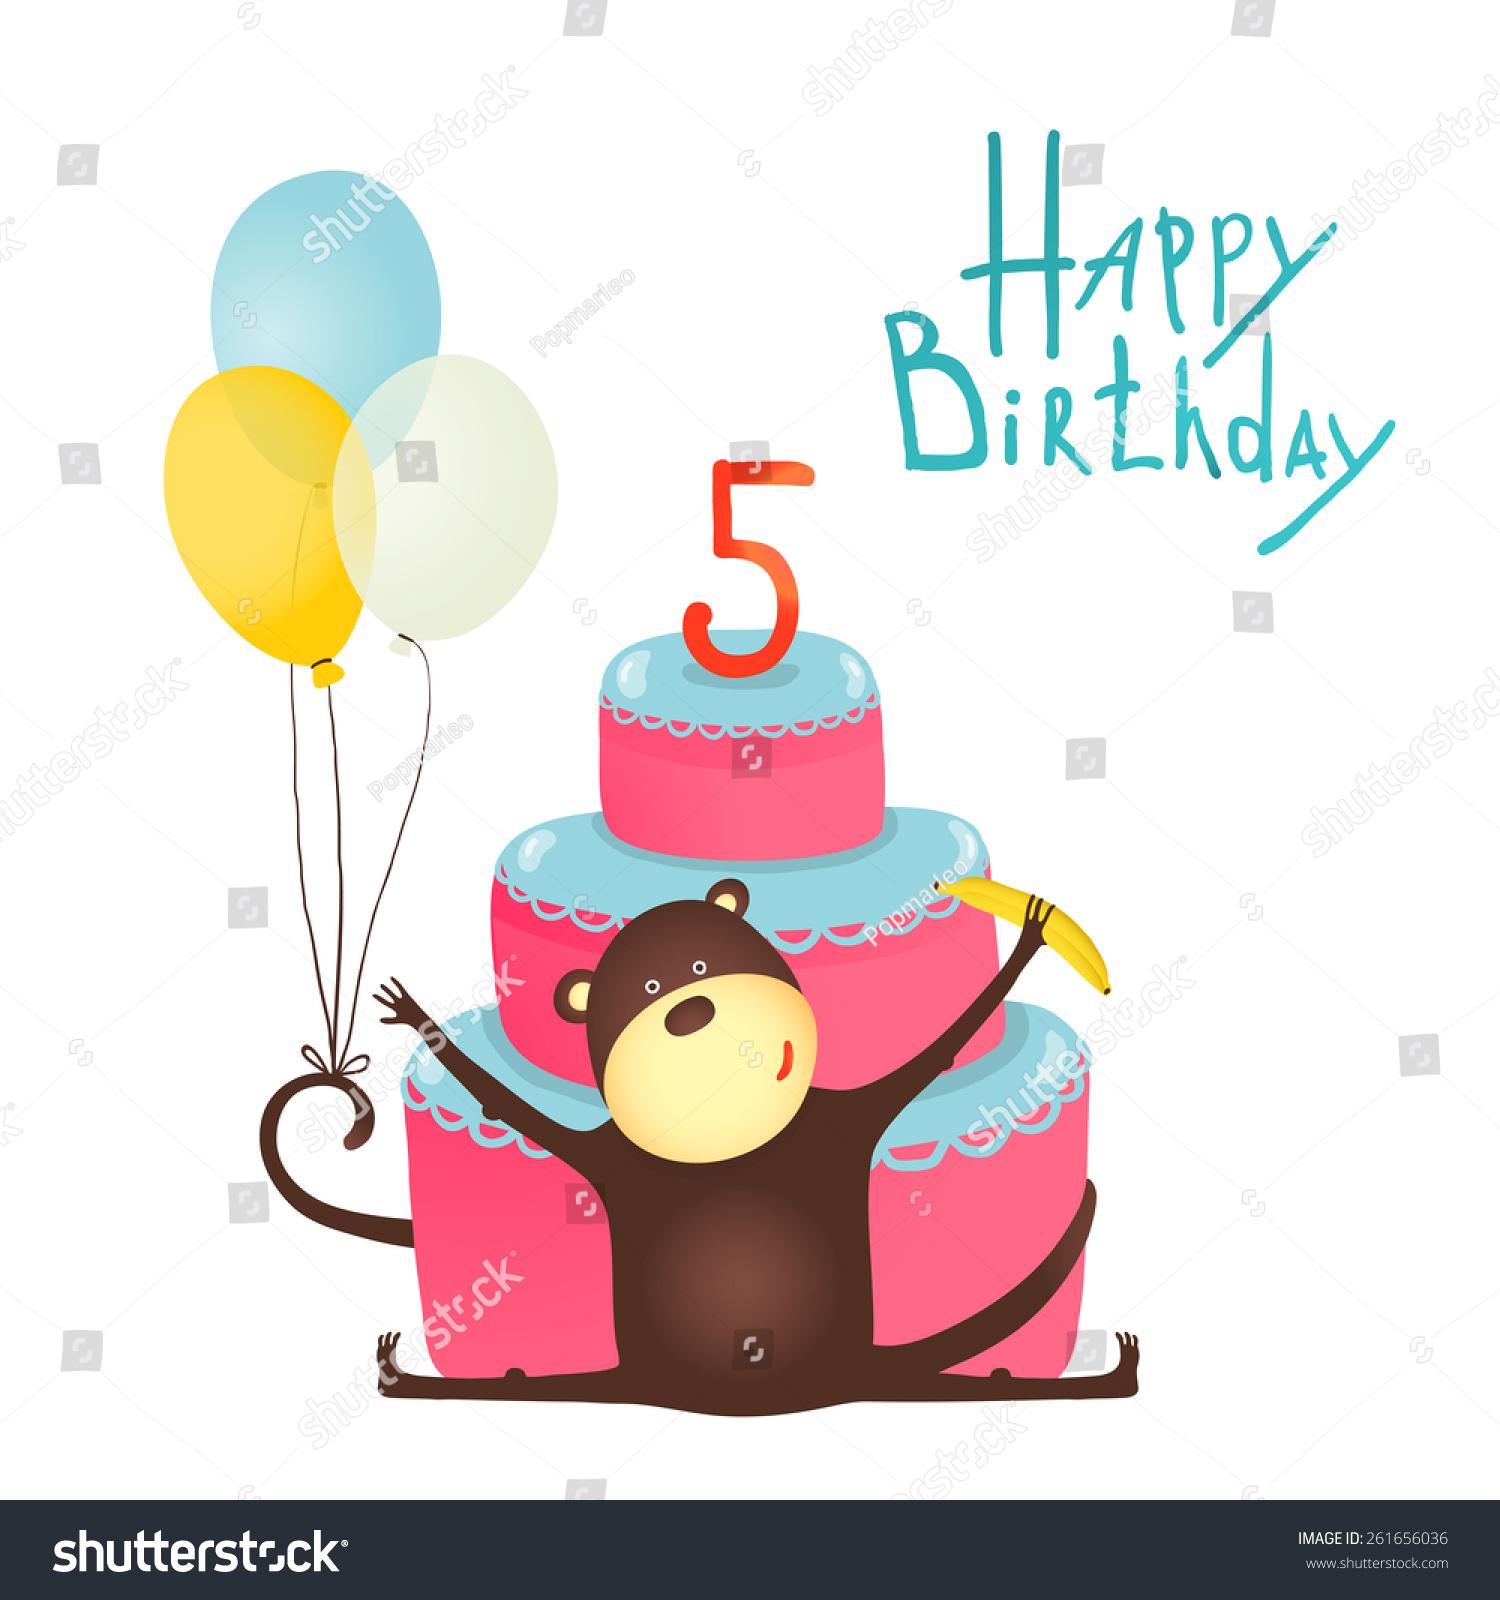 Funny Monkey Greetings Balloons Cake Monkey Stock Illustration